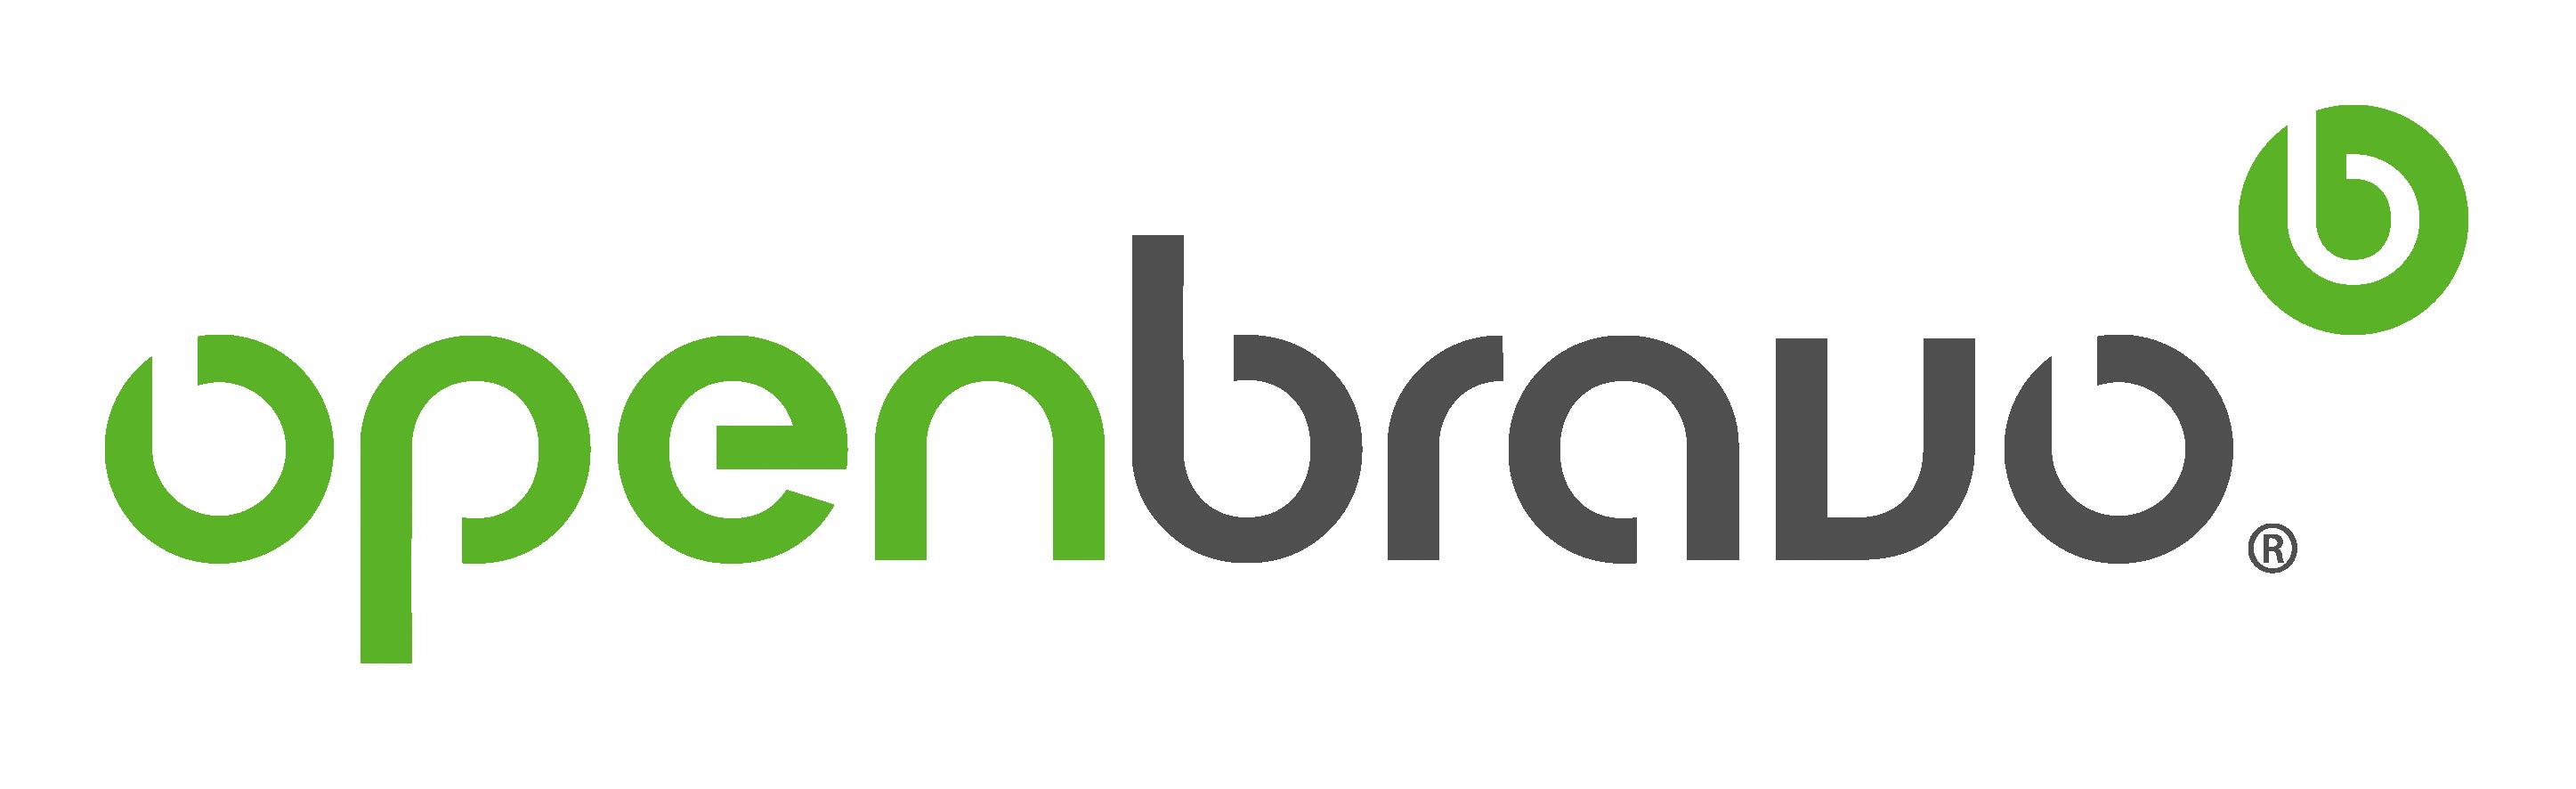 Openbravo_logo_TRANS3